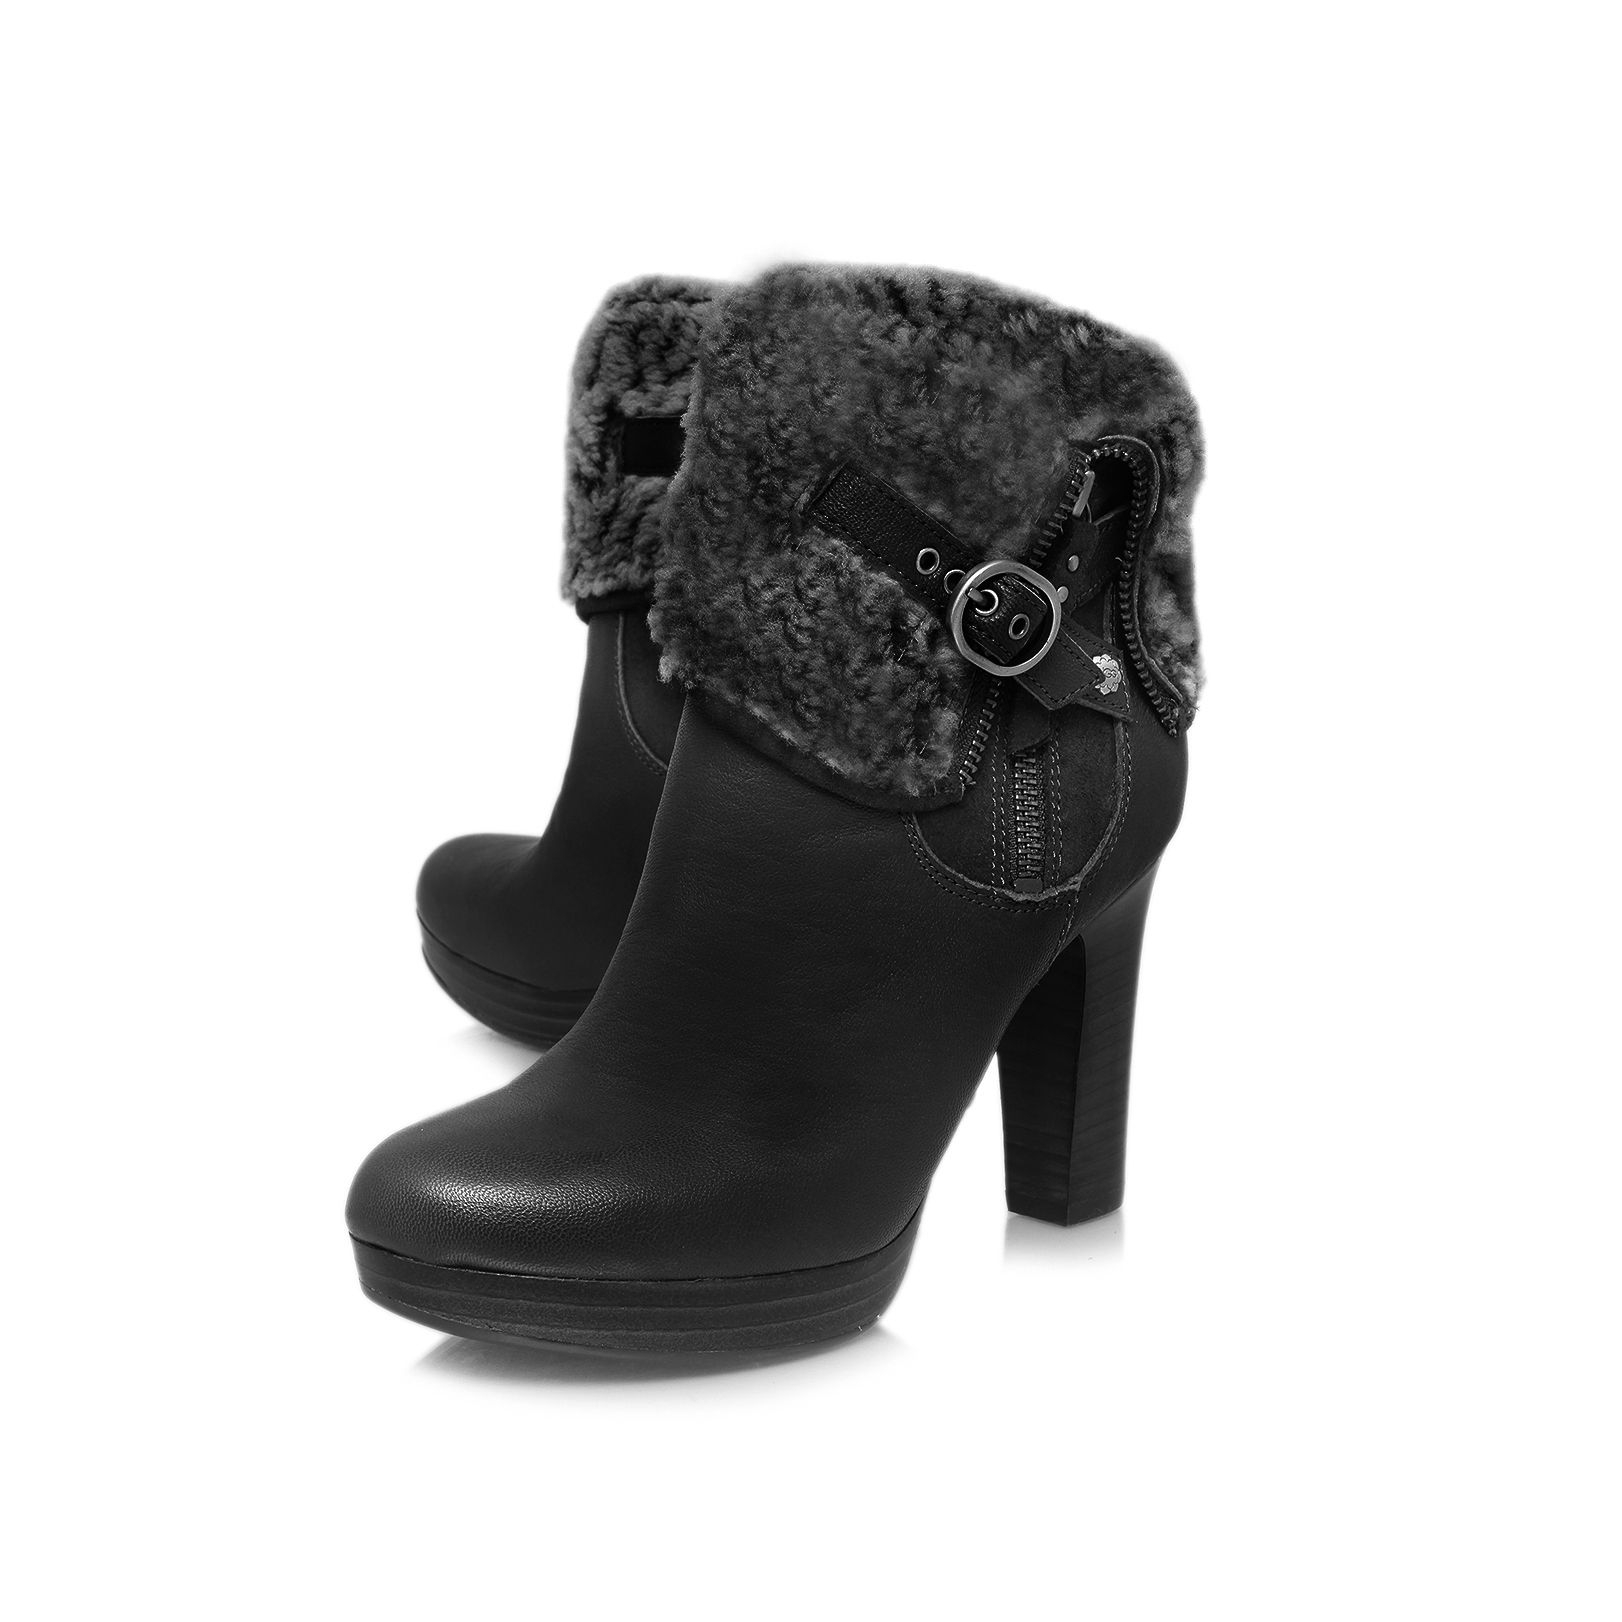 Black Ugg Heeled Boots